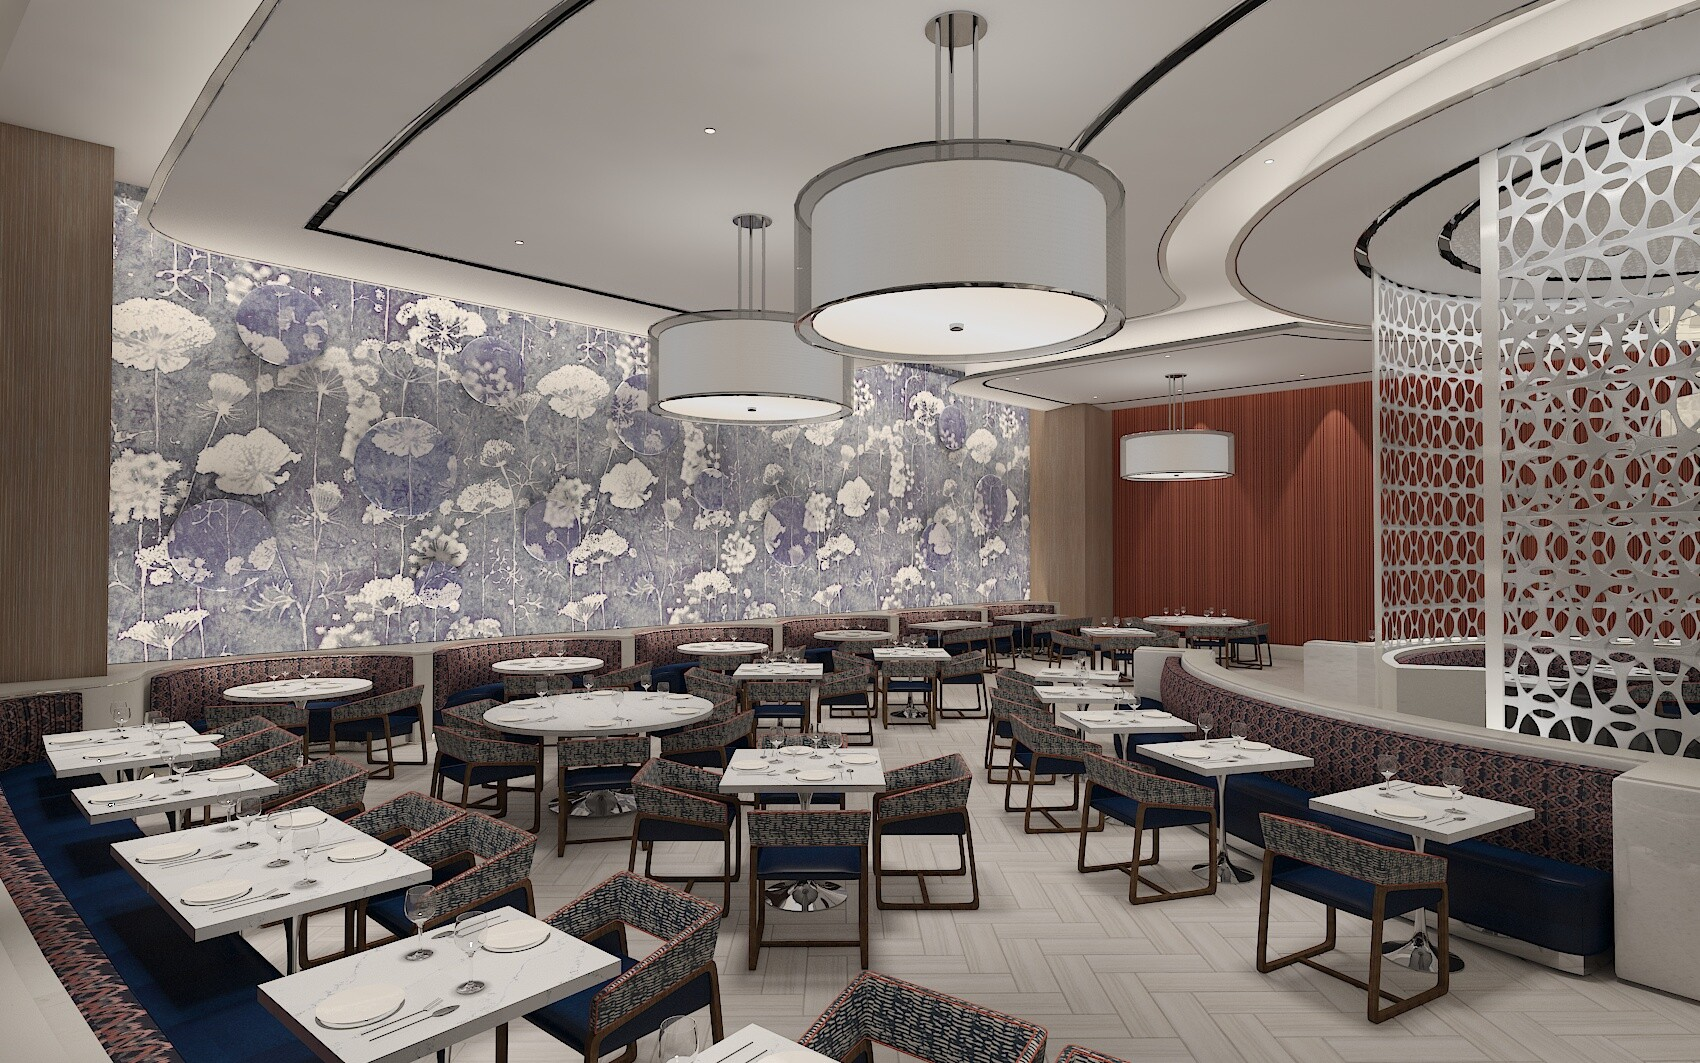 RWLV_The Kitchen at Resorts World_Interior.jpg